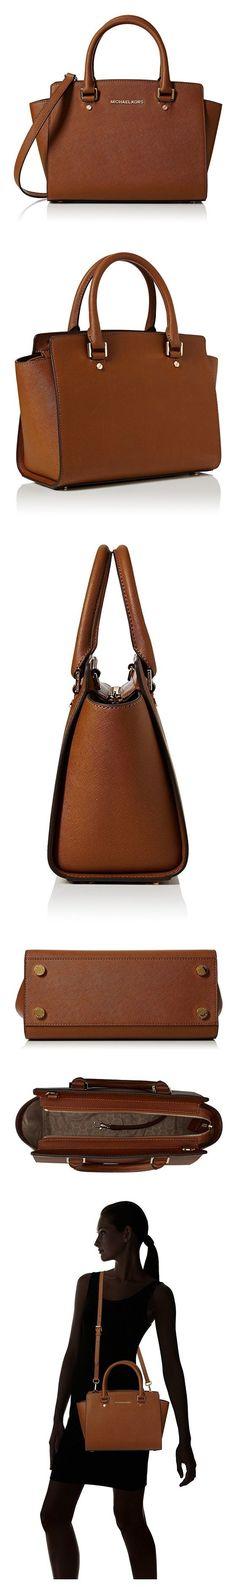 7641547341b9 MICHAEL Michael Kors Selma Medium Satchel  Handbags  Amazon.com